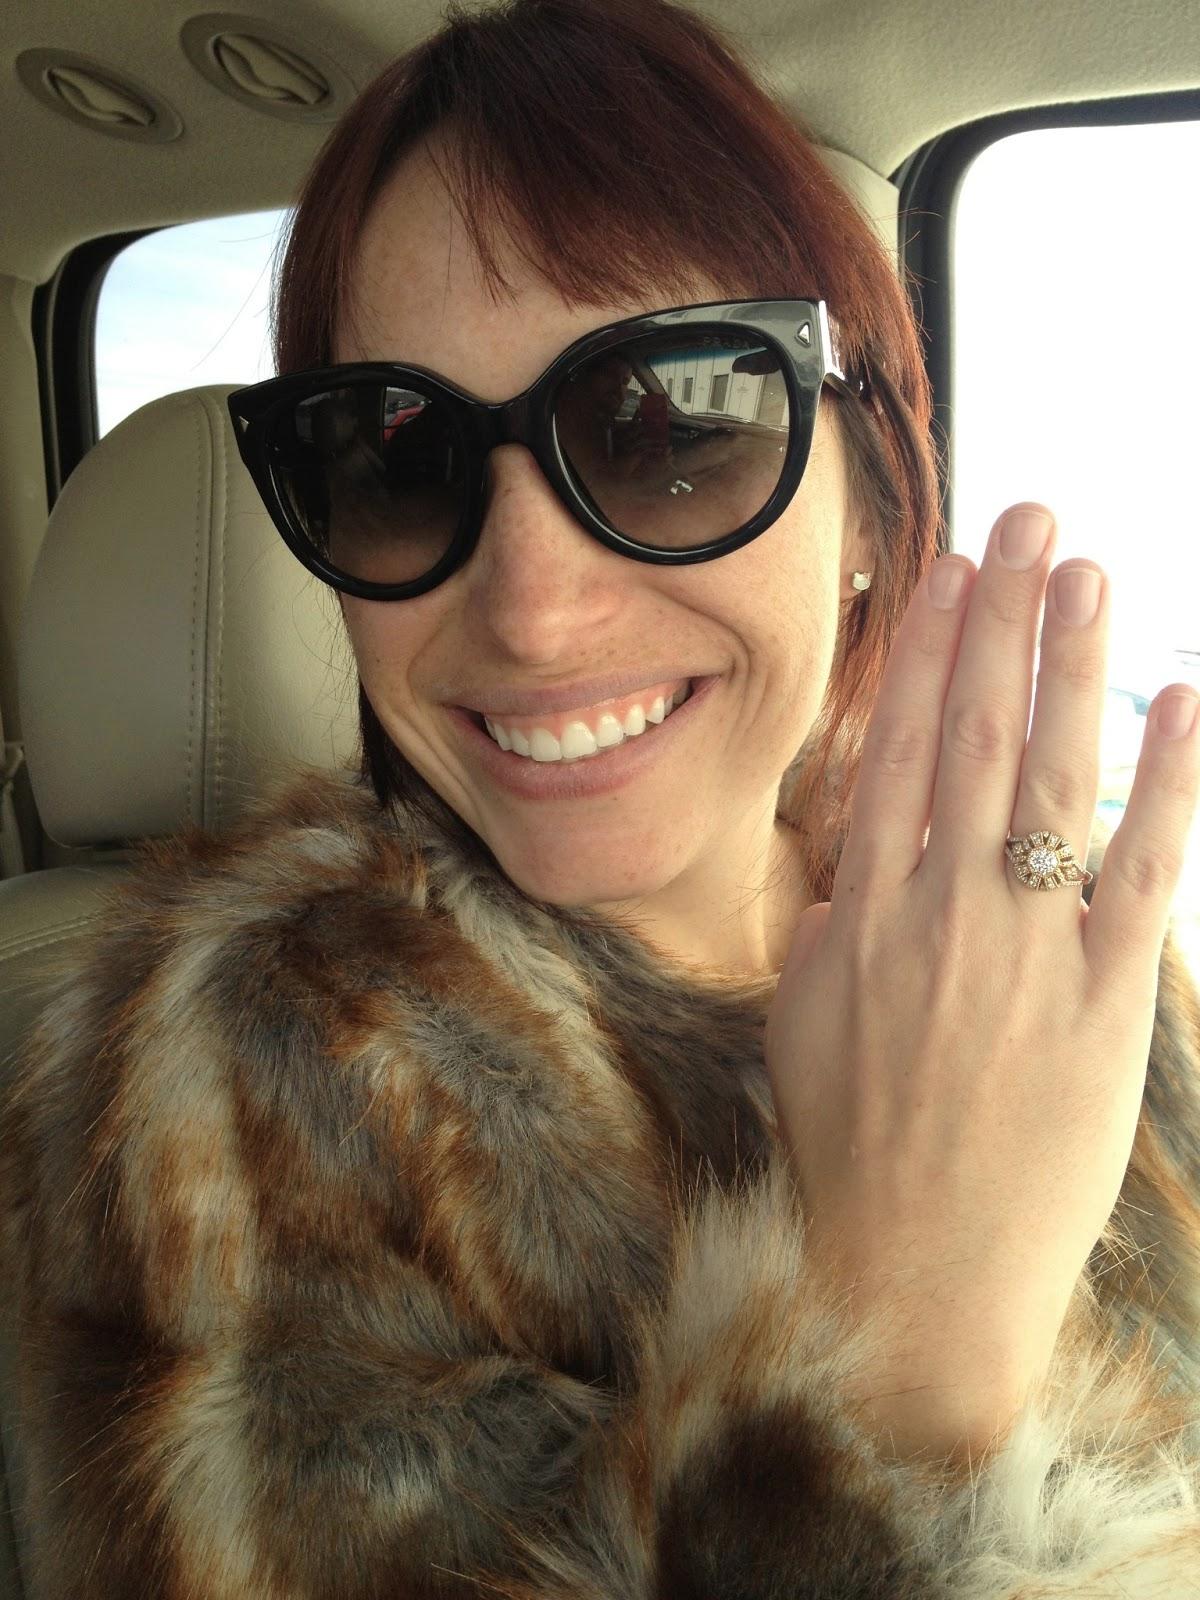 nordstrom, prada, prada cat eye, prada cat eye sunglasses, prada sunglasses, sunnies, fur coat, faux fur, diamond ring, diamonds, diamond, gold ring, engagement ring,  freckles, love story, date, romantic date,